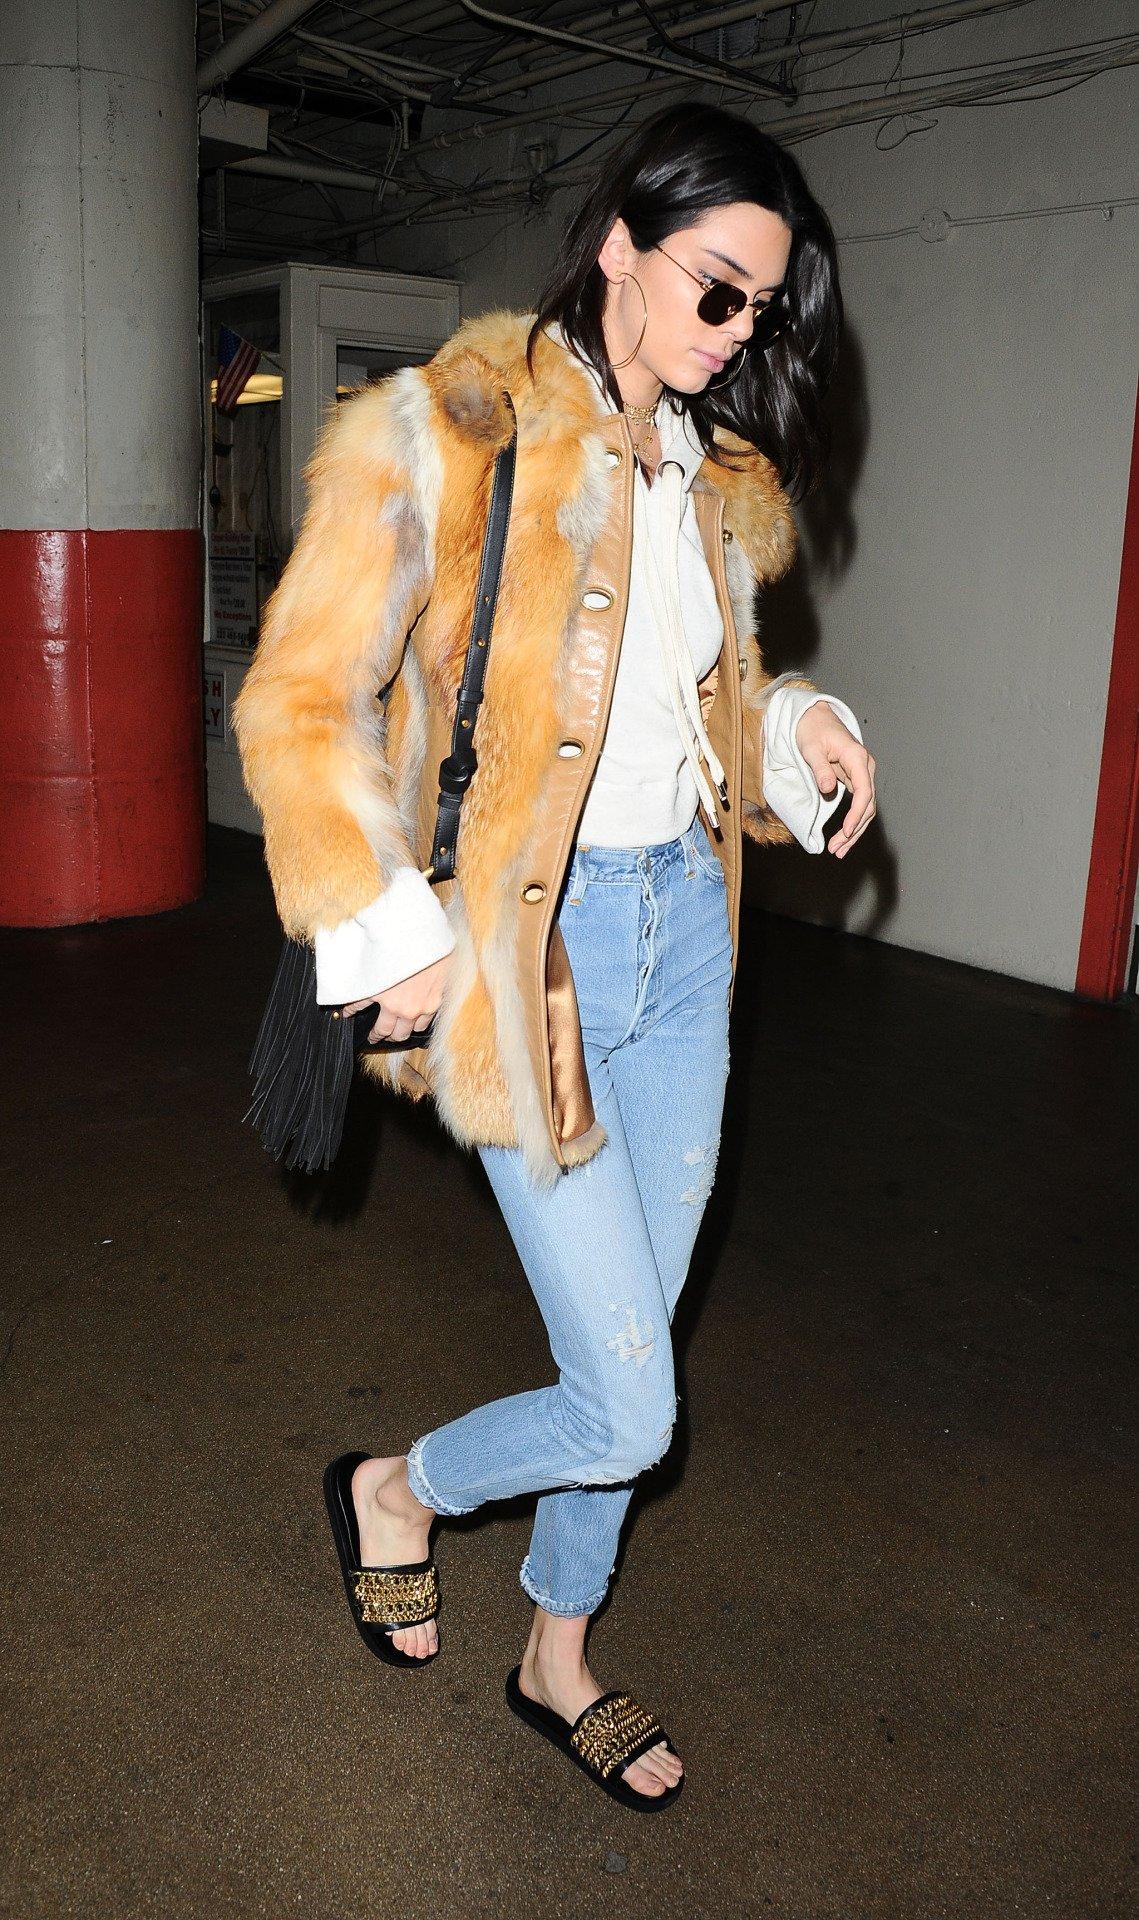 Established+Jewelry+Press,+Celebrity+Kendall+Jenner-1.jpeg